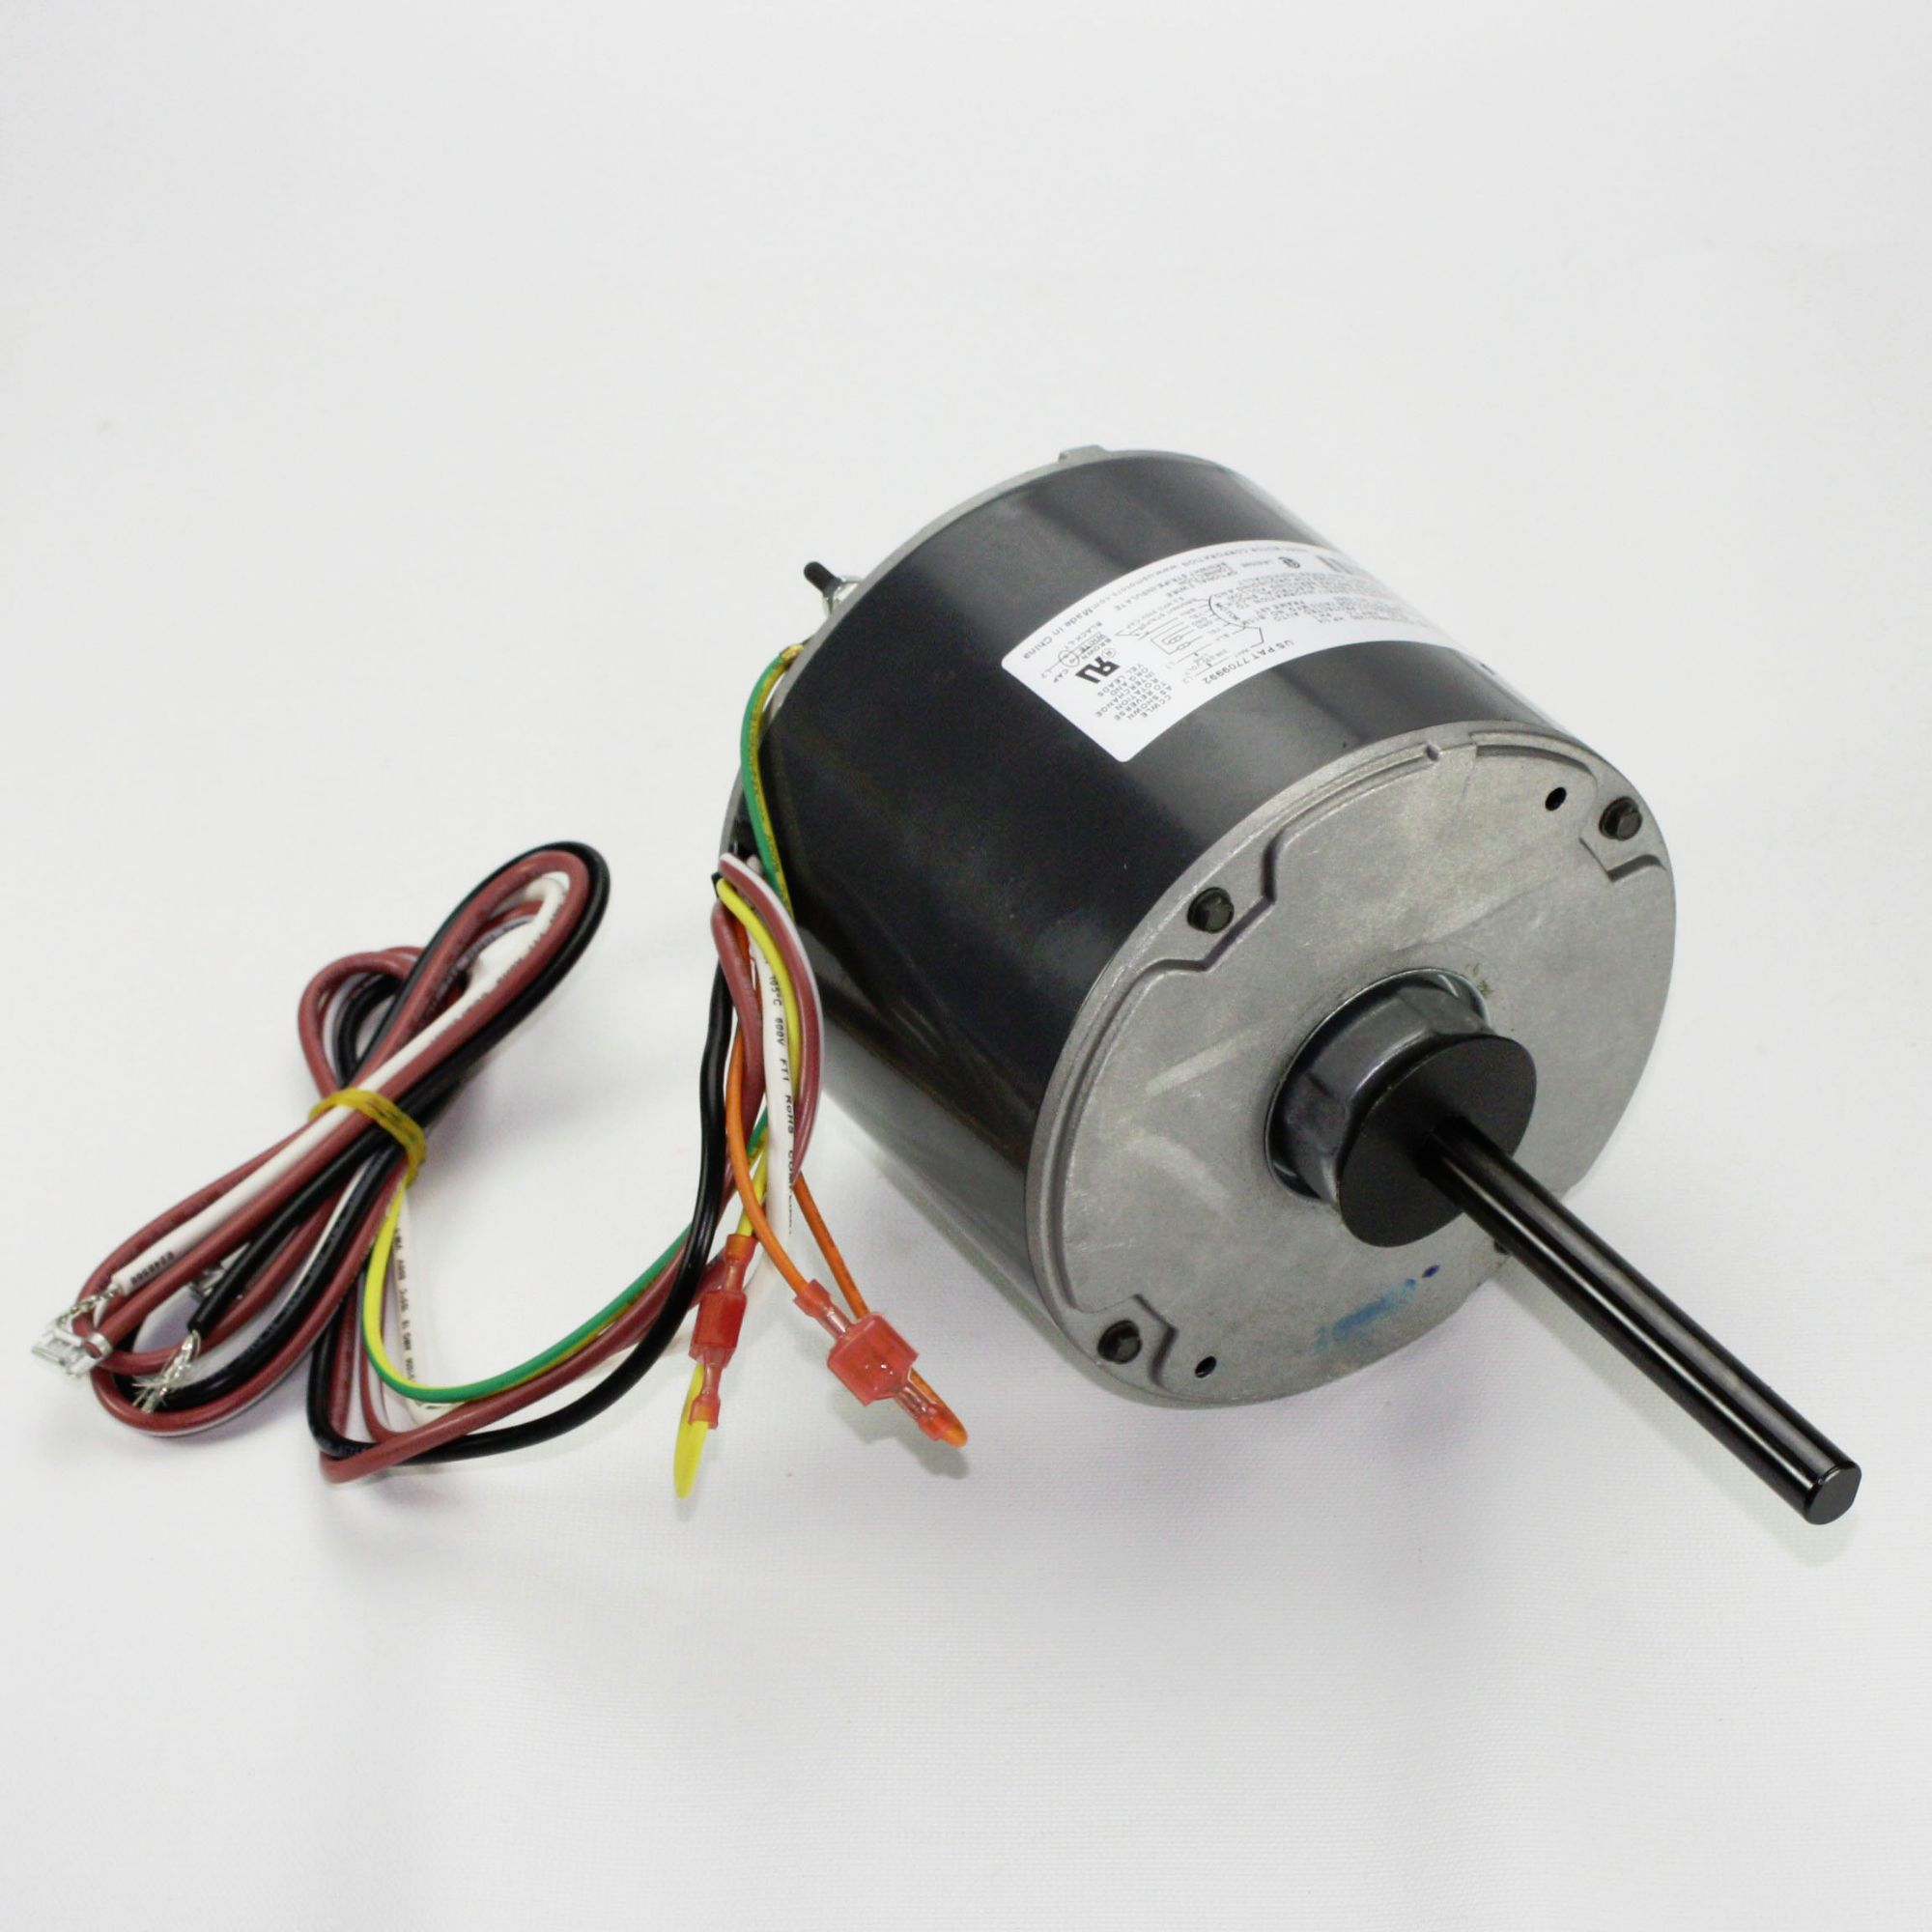 Us Motors 1860 Wiring Diagram Electric Motor Hvac 1 4 Hp Condenser Ebay Rh Com Ac